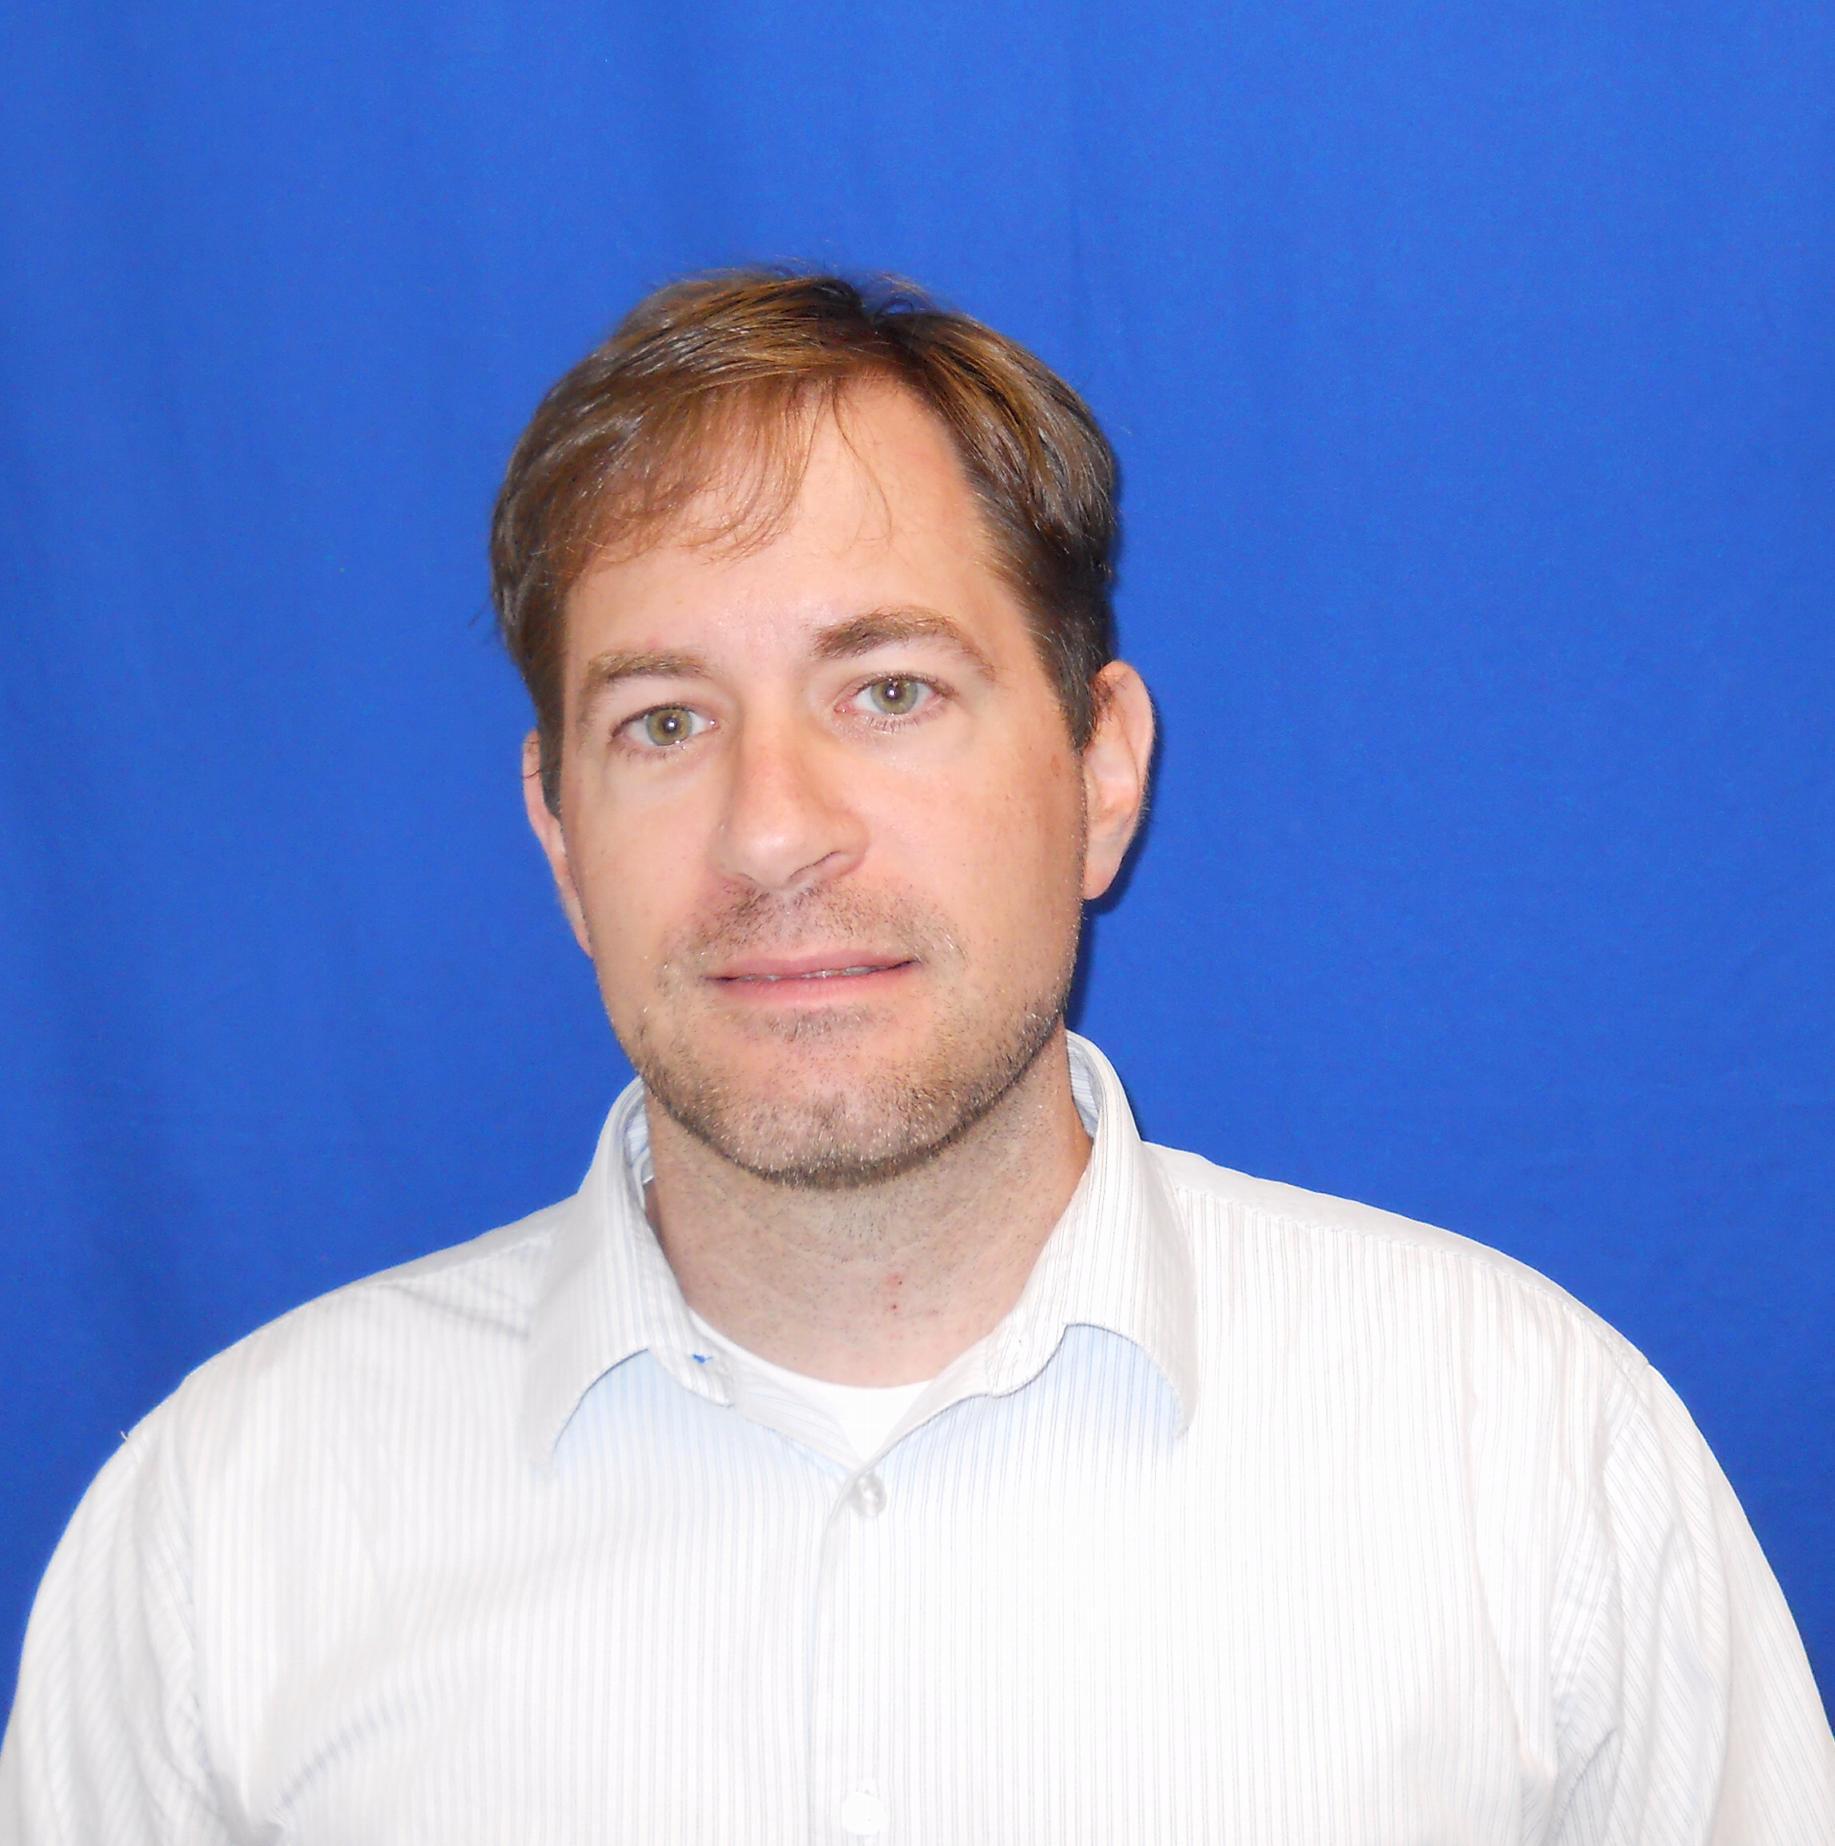 photo of BUSHMAN BRENDON